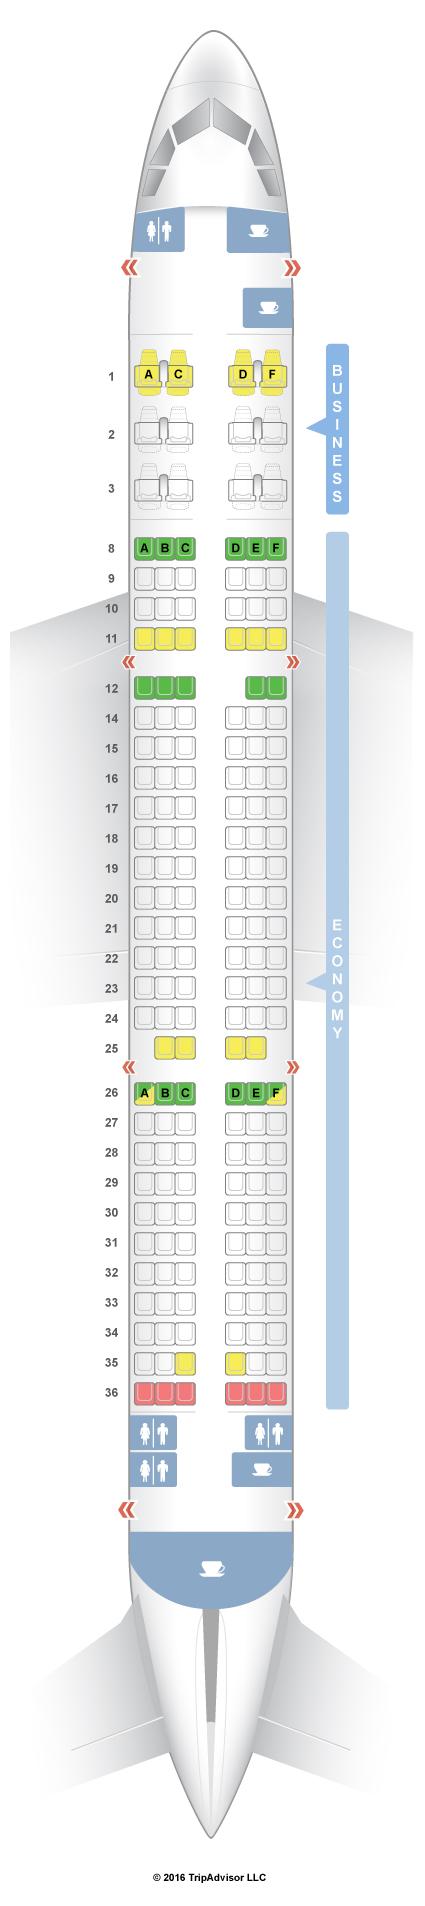 SeatGuru Seat Map Qatar Airways Airbus A321 (321) V1